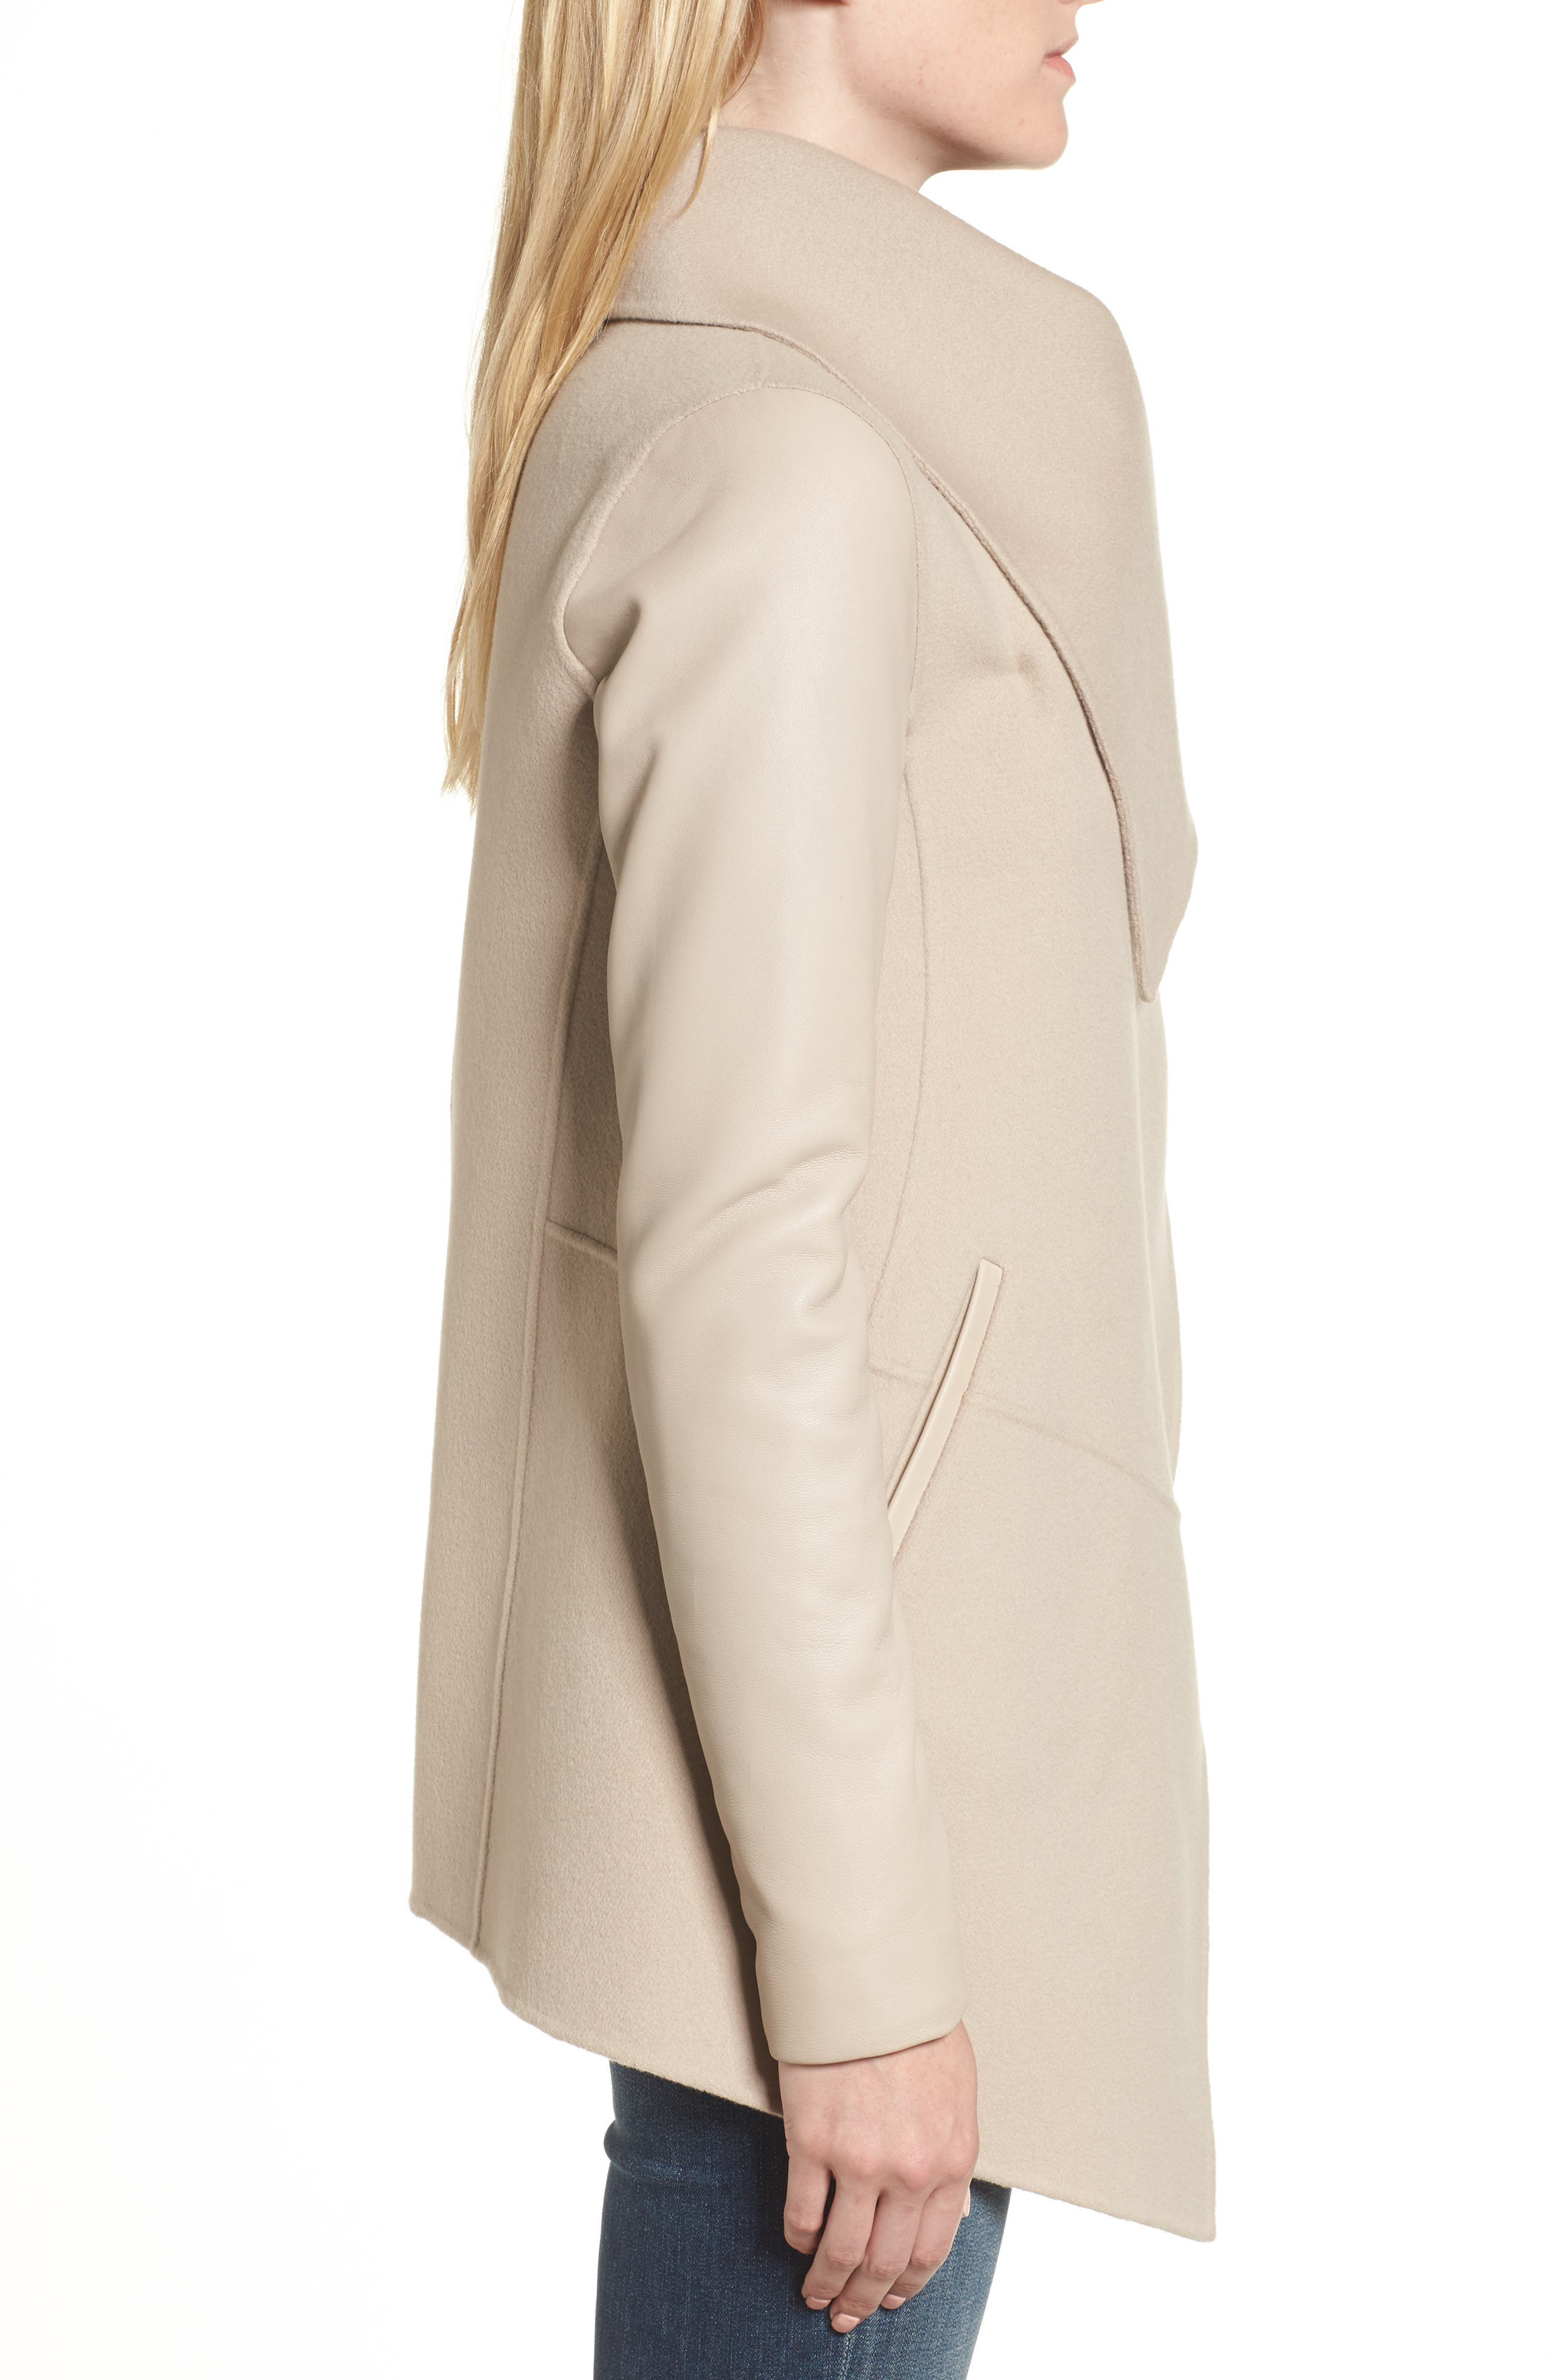 Vane Asymmetrical Leather Sleeve Coat,                             Alternate thumbnail 3, color,                             Sand